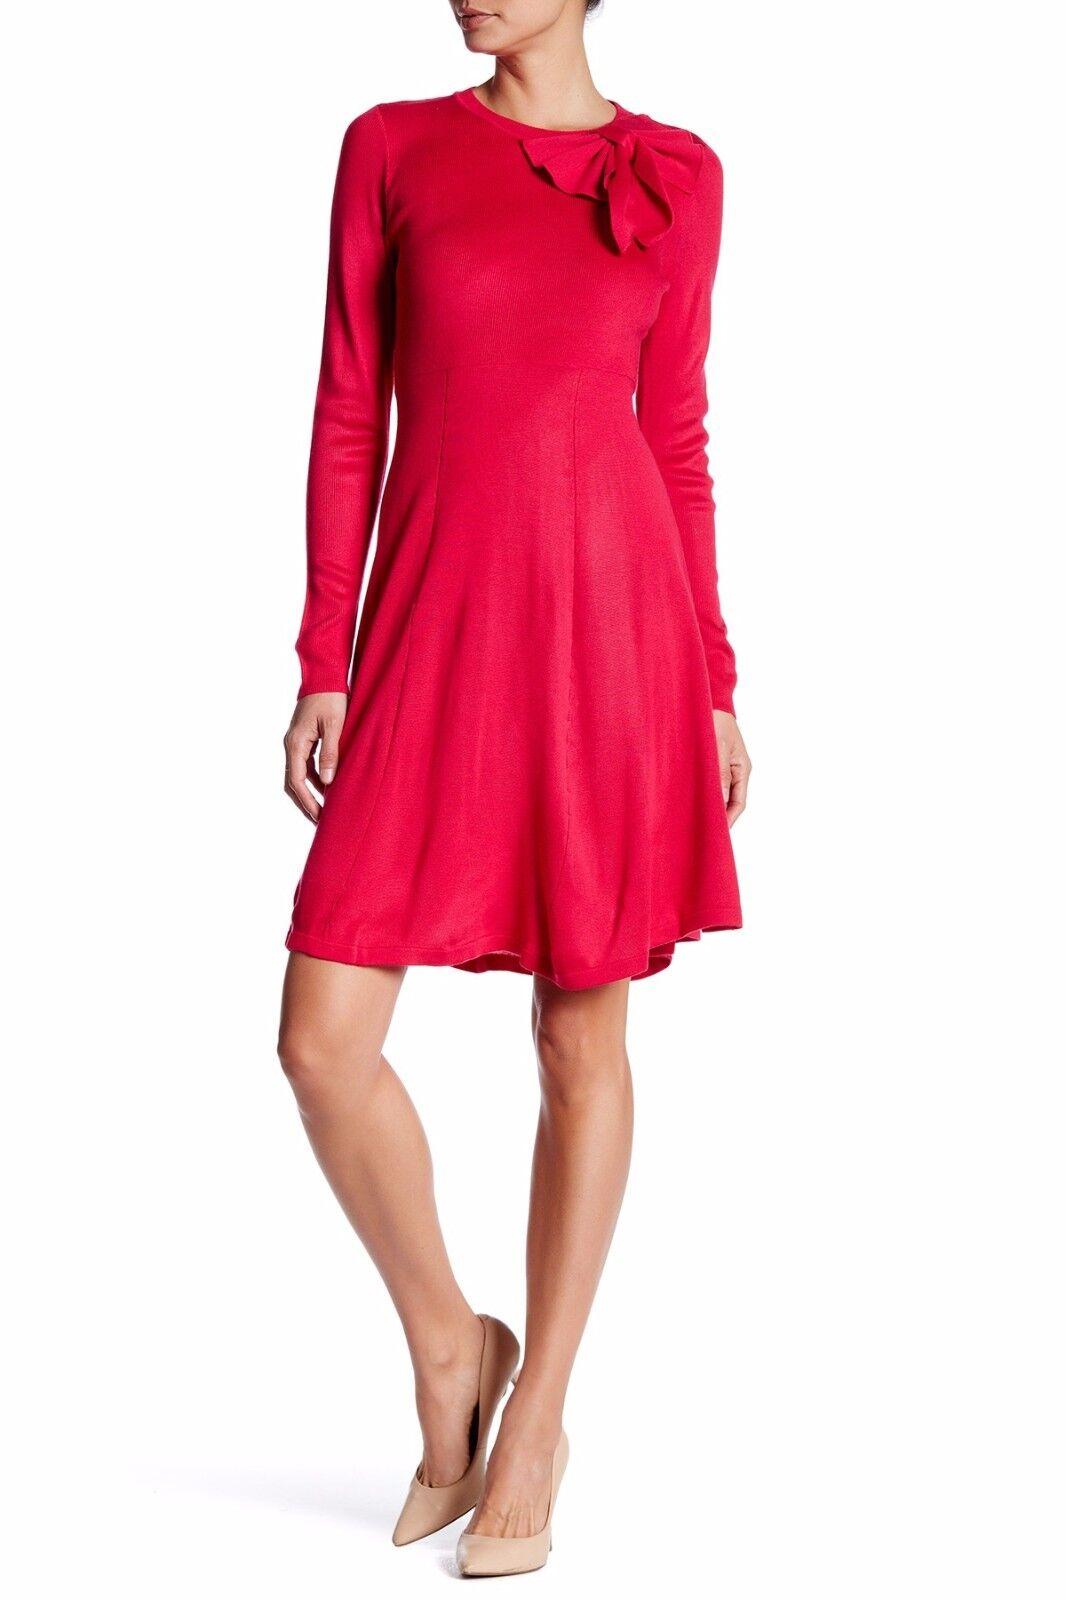 Eliza J Empire Bow Bow Bow Waist Dress  ( Size XL ) 7aae1c